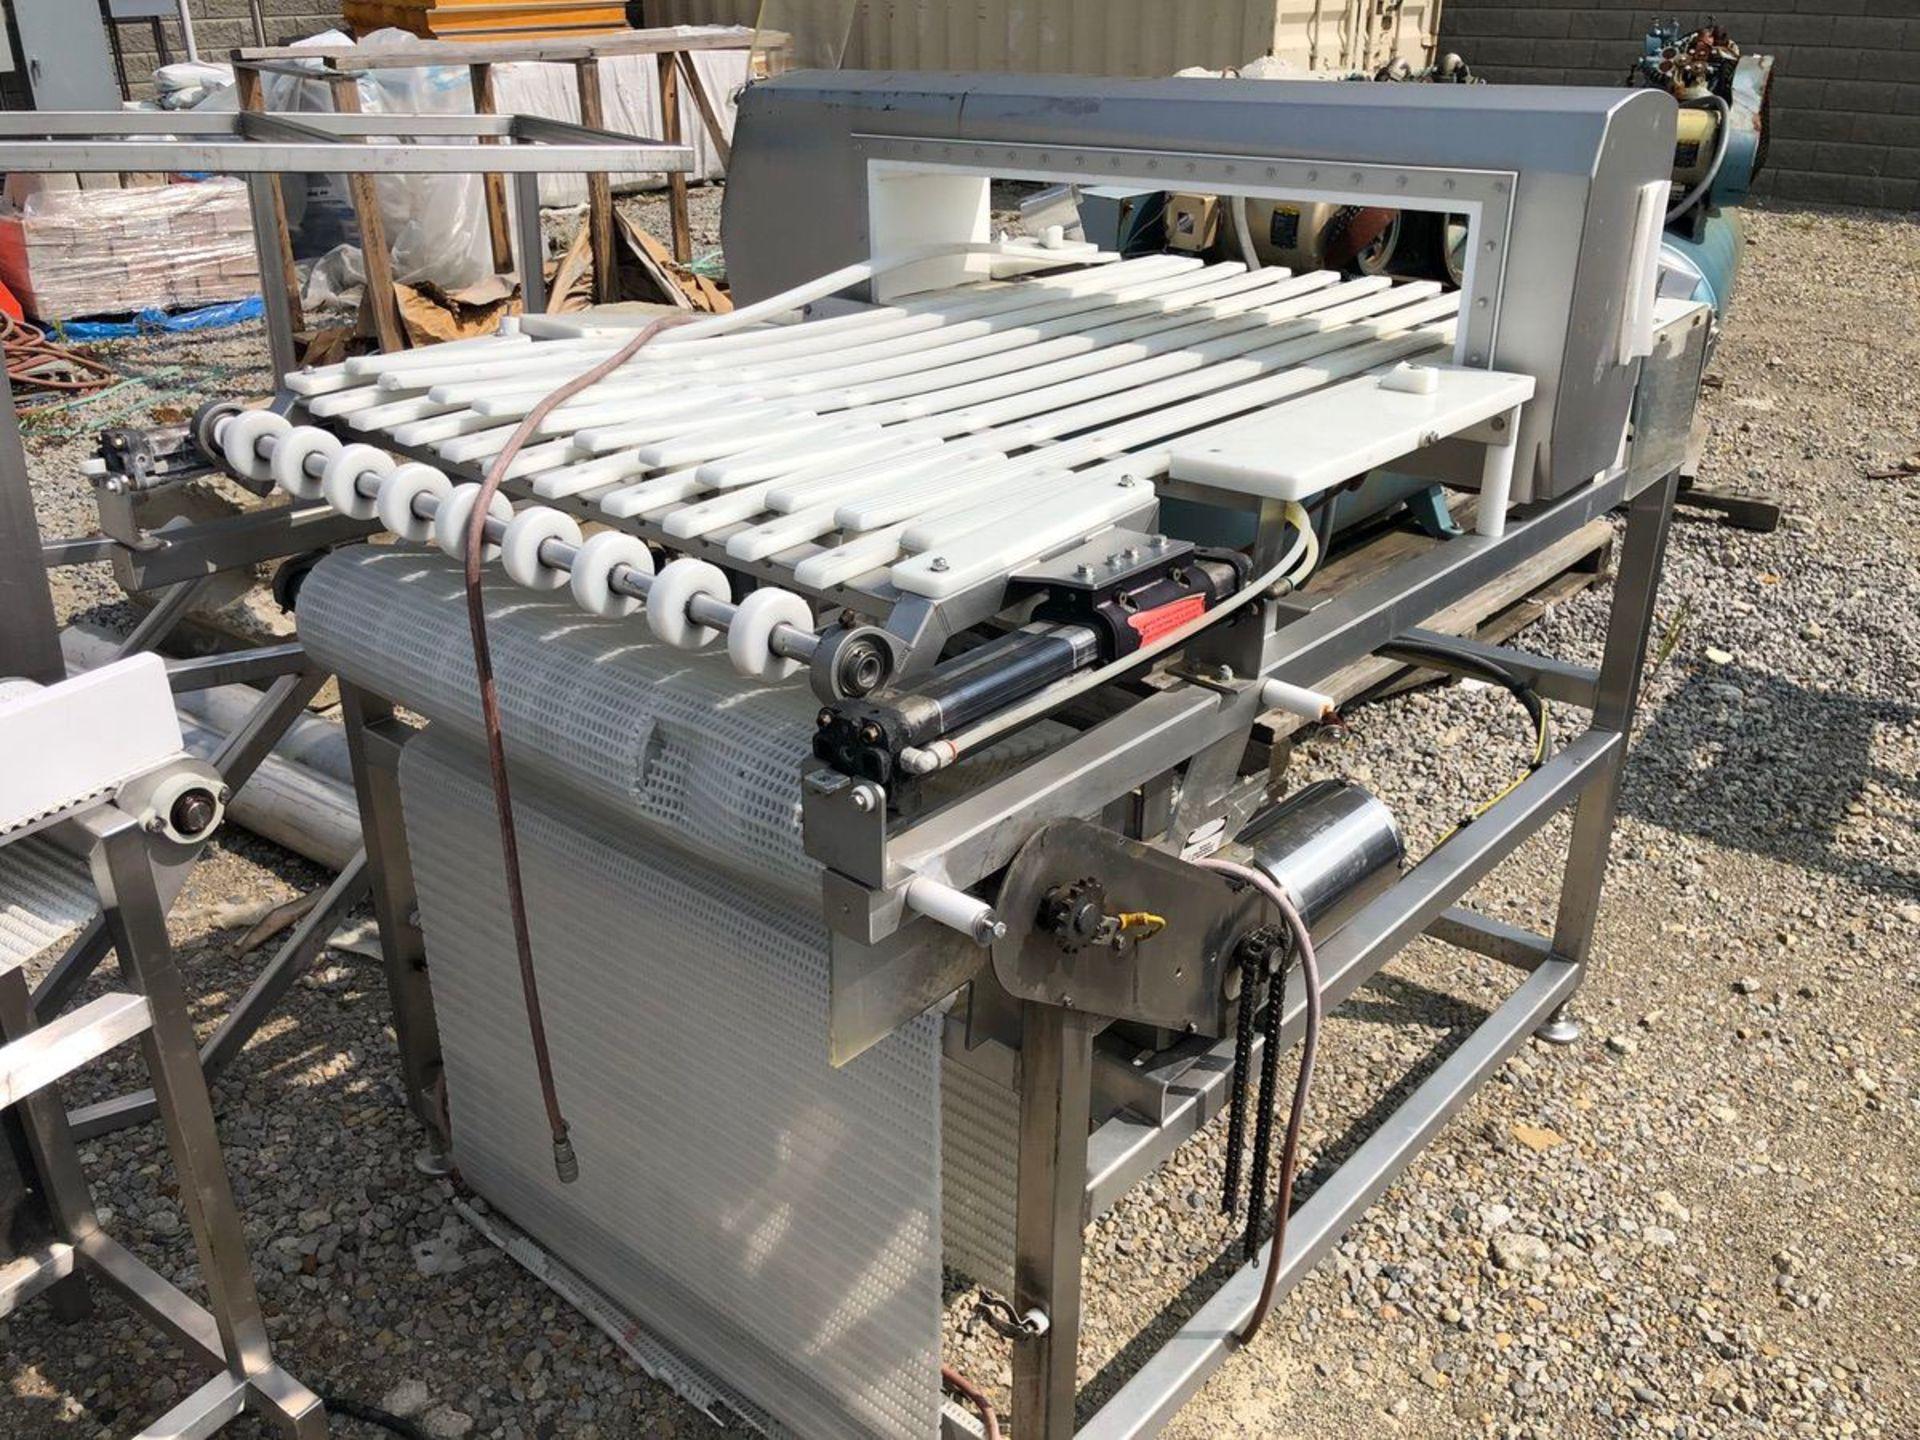 Safeline PowerPhasePro Metal Detector, Approx Aperture 36in W x 7in C | Rig Fee: $150 See Full Desc - Image 4 of 4